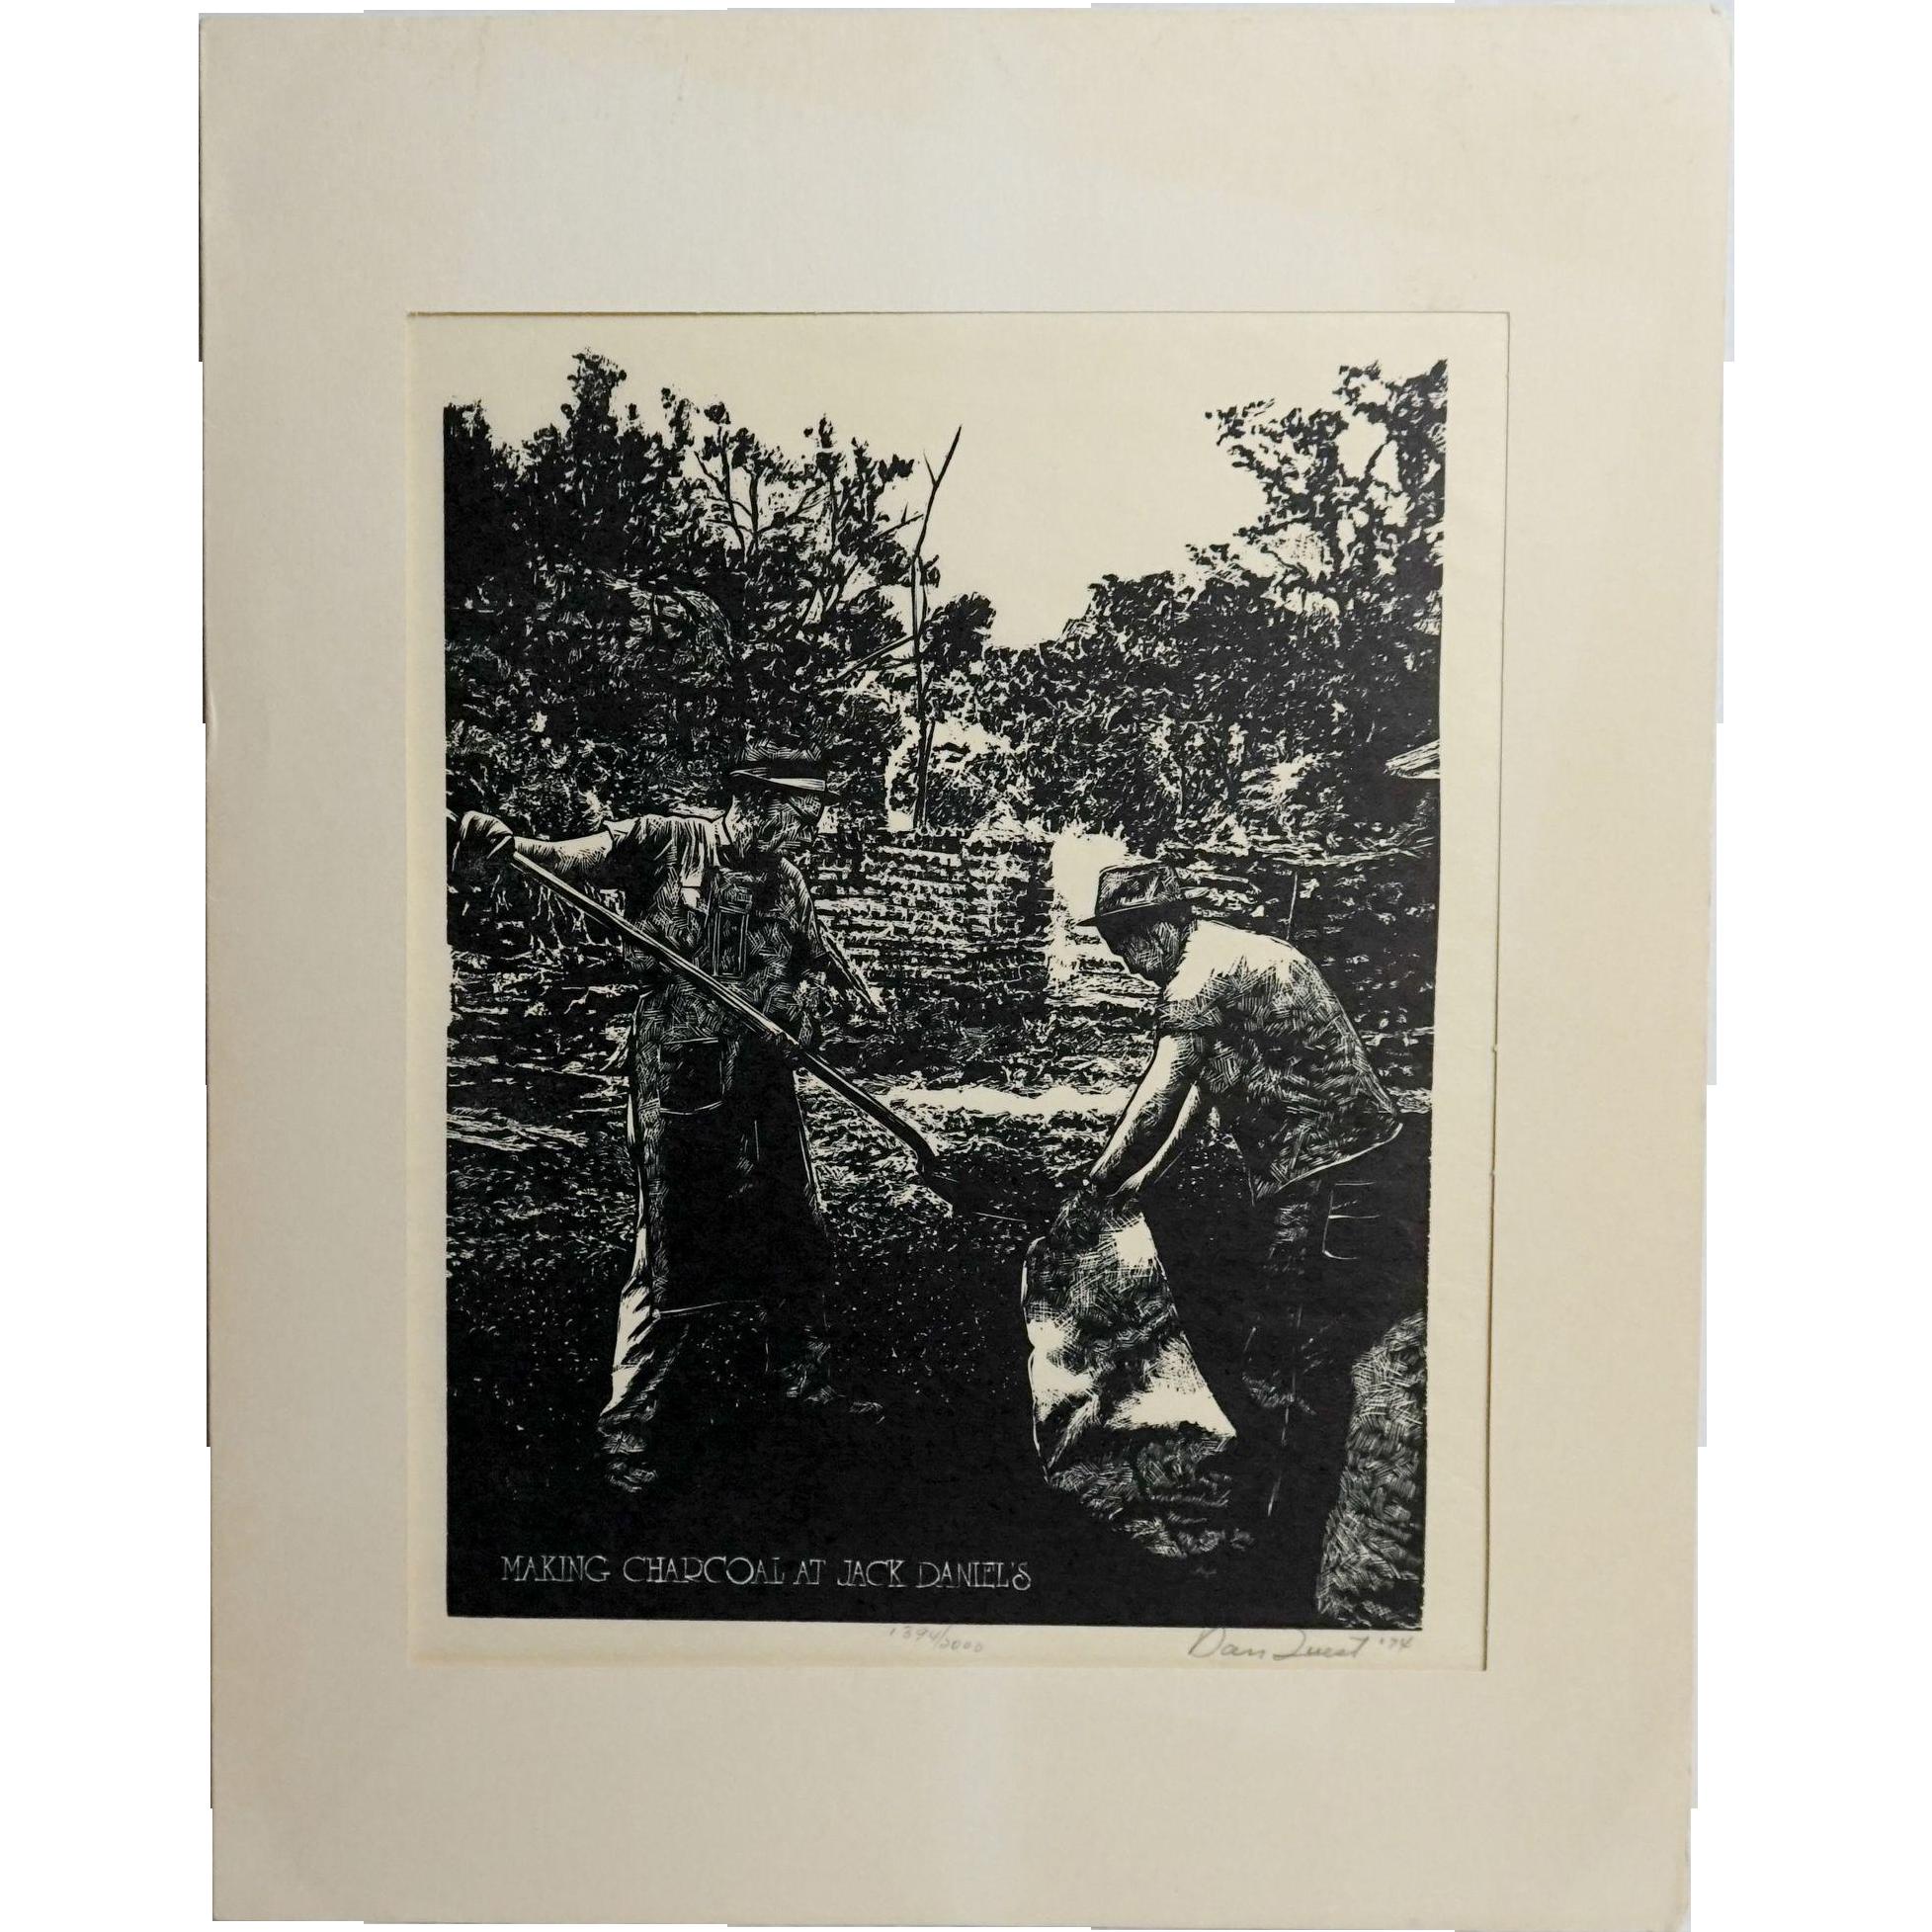 1974 Making Charcoal at Jack Daniels, Original Woodcut by Dan Quest